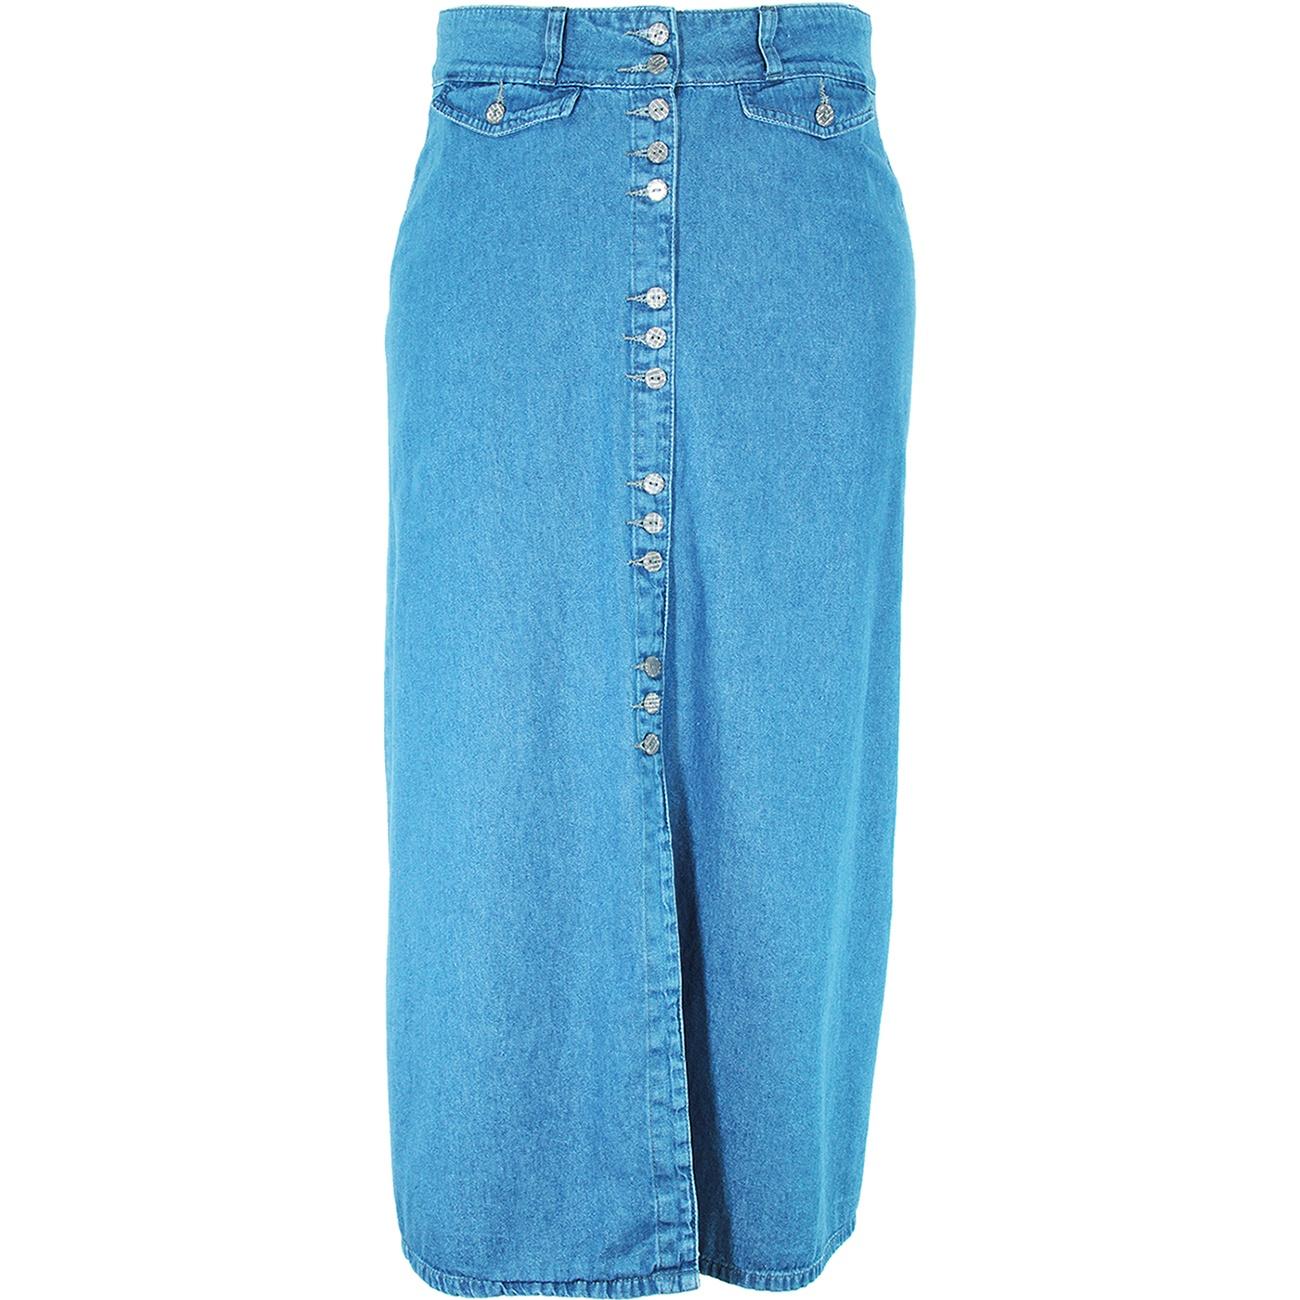 Saia Longa Eruption Jeans Botões [7801DEL]